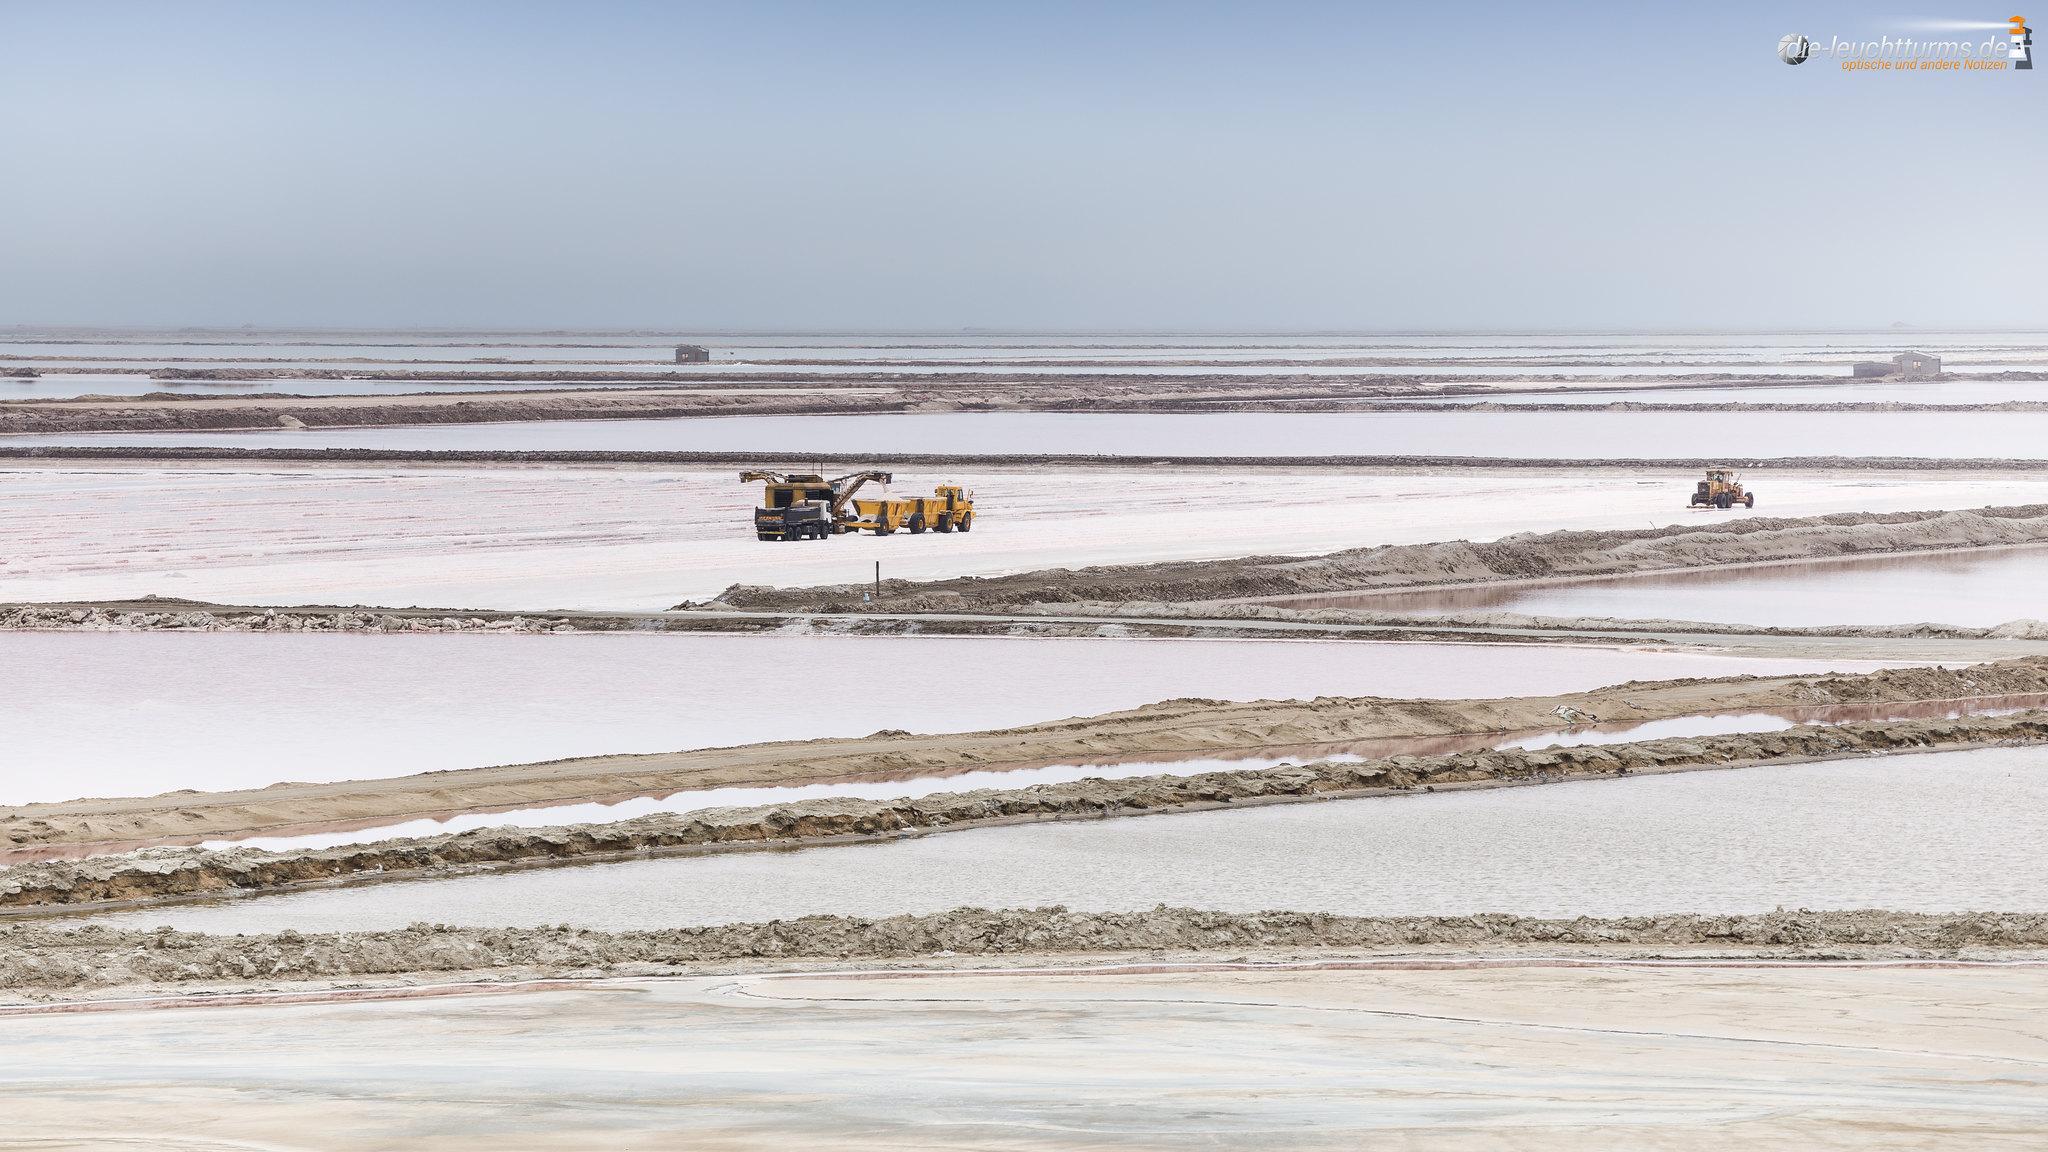 Salt mining